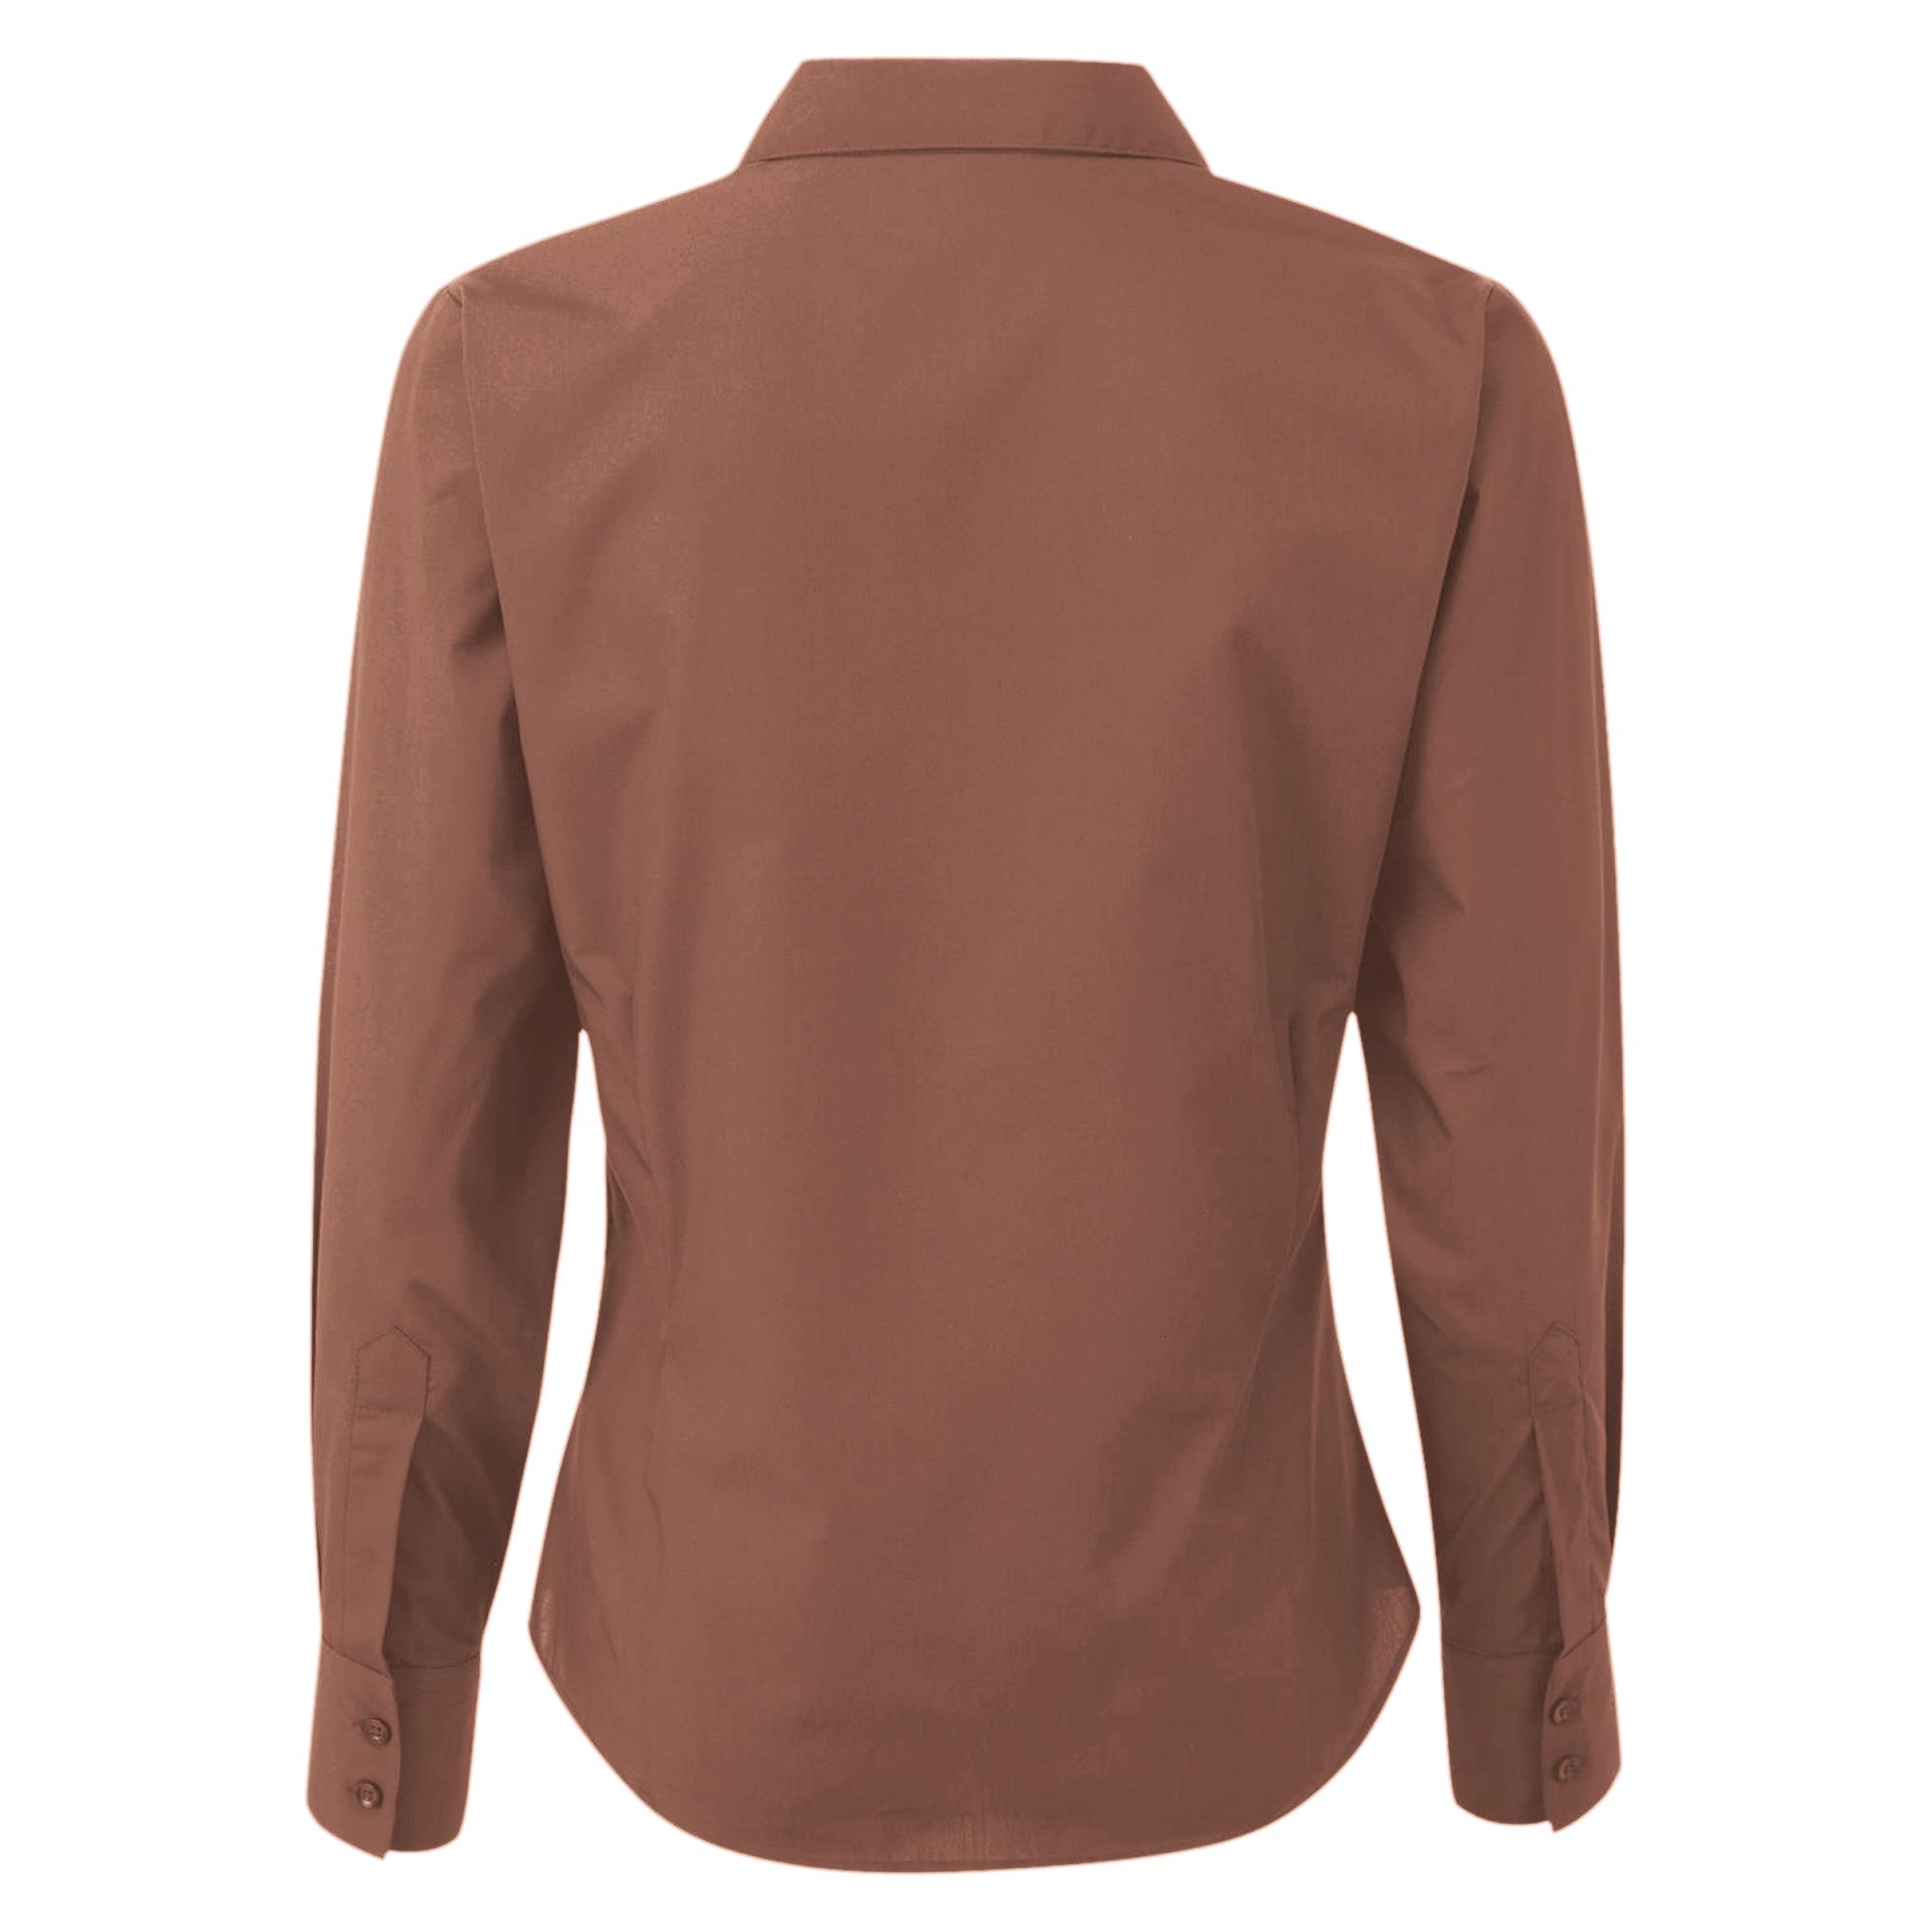 Premier Womens/Ladies Poplin Long Sleeve Blouse/Plain Work/Office ...